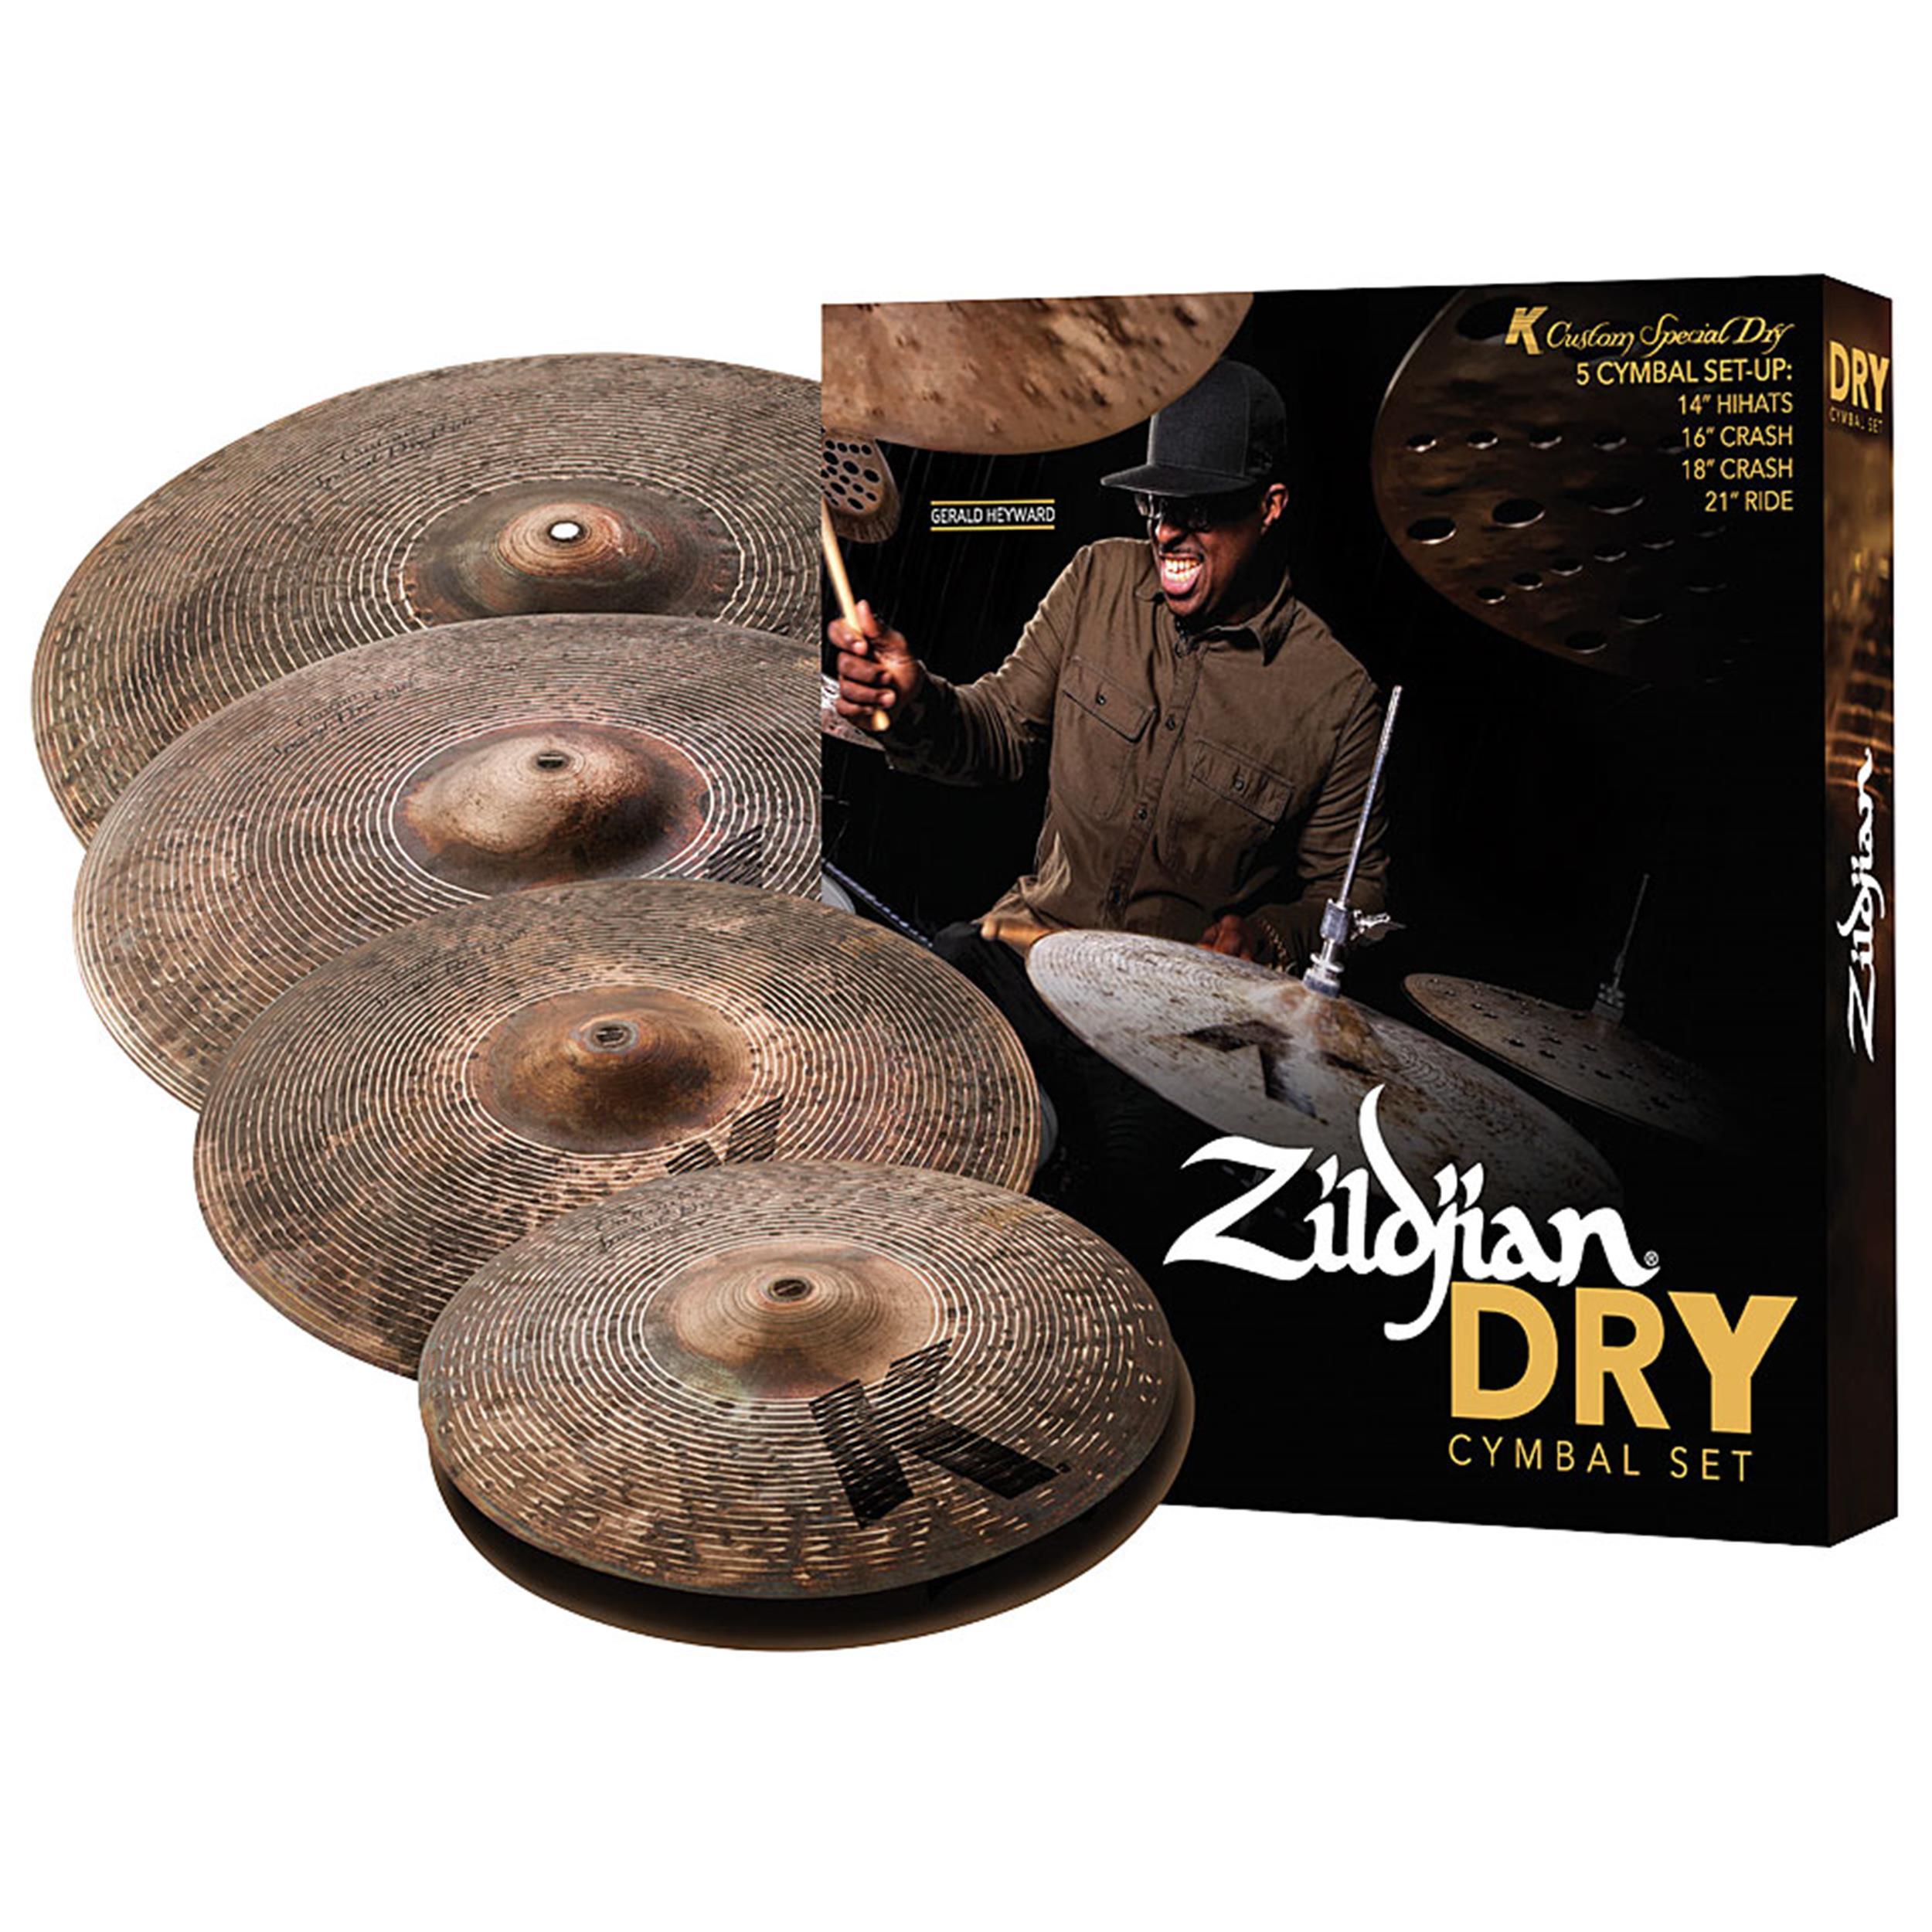 Zildjian Cartone 5 K Custom Special Dry (KCSP4681): ride + hi-hat + 2 crash